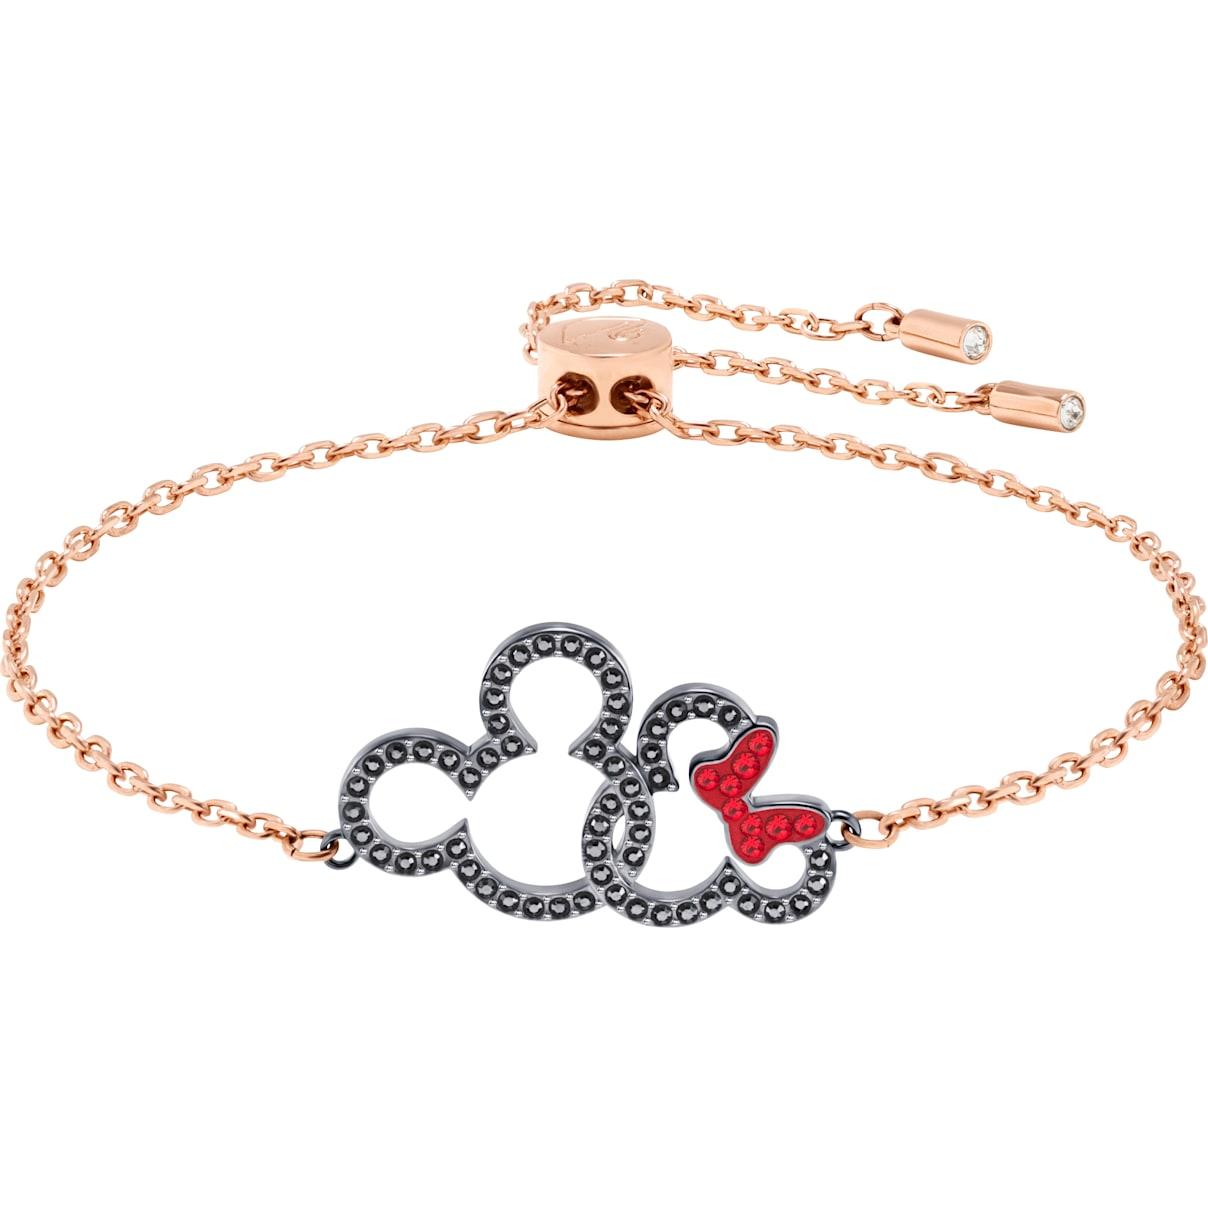 Swarovski Mickey & Minnie Bracelet, Multi-colored, Mixed metal finish